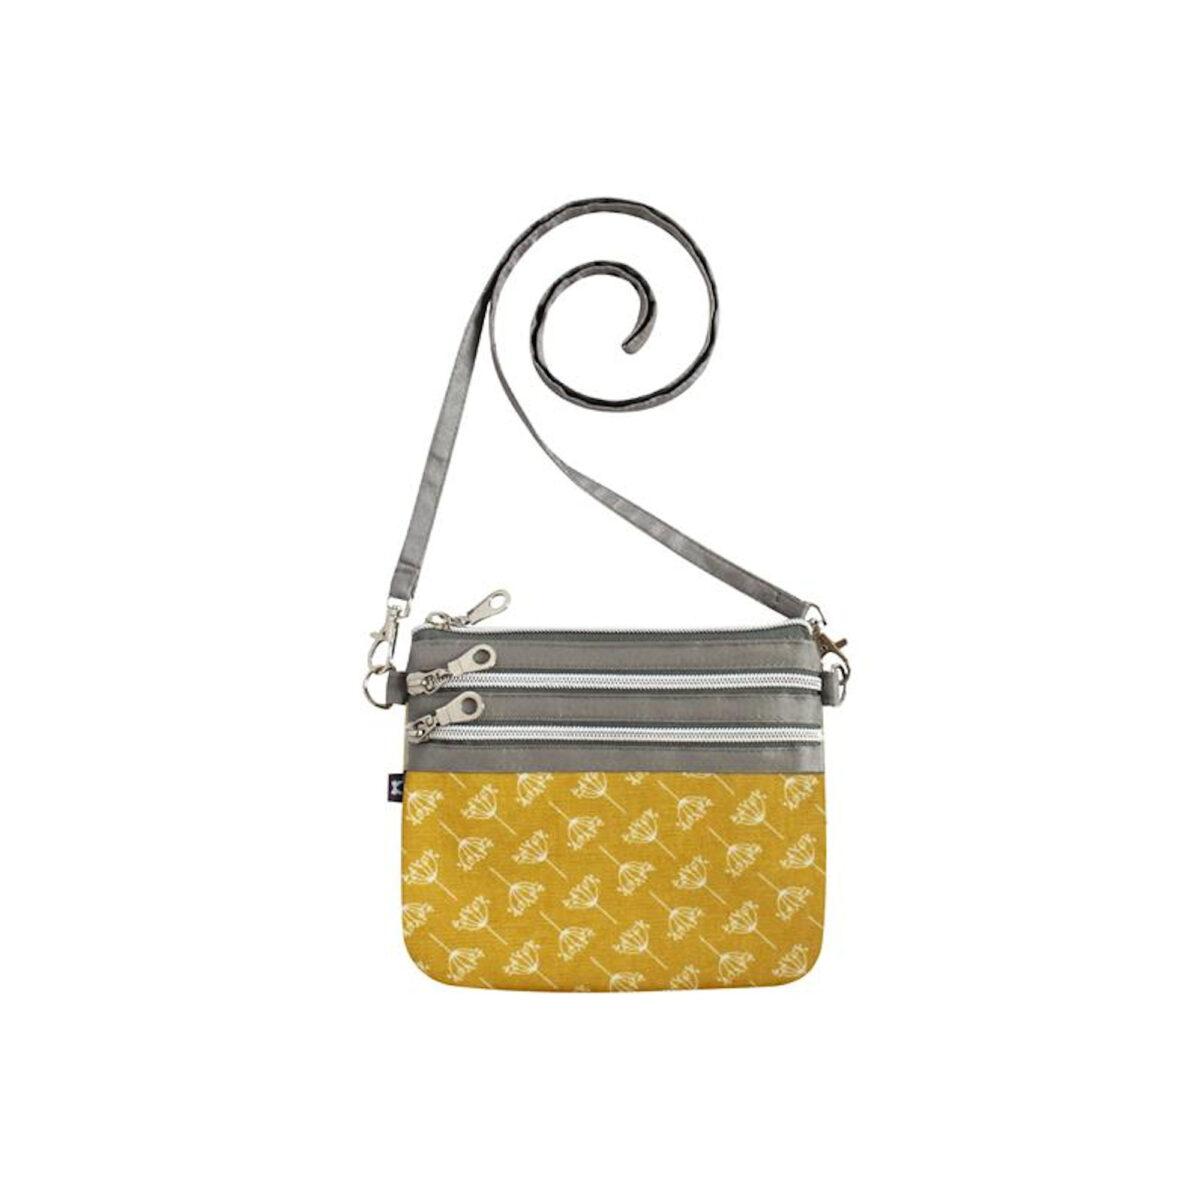 Dandelion Mustard Oil Cloth 3 Zip Pouch Bag